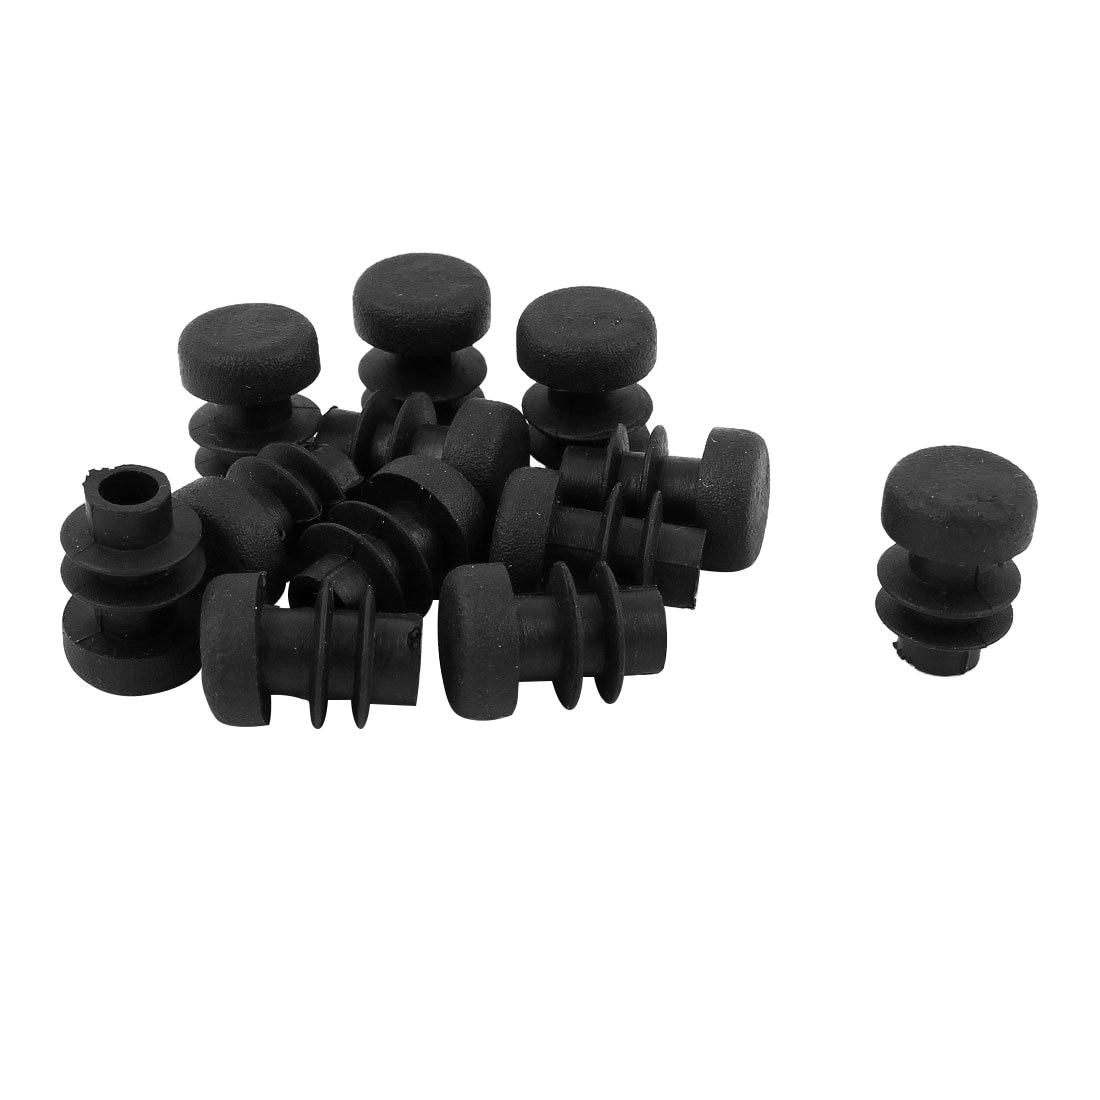 12 Pcs Kunststoff 12mm Rohr Ende Ausblendung Caps Bung Rohr Insert Plug Runde Schwarz Elegante Form